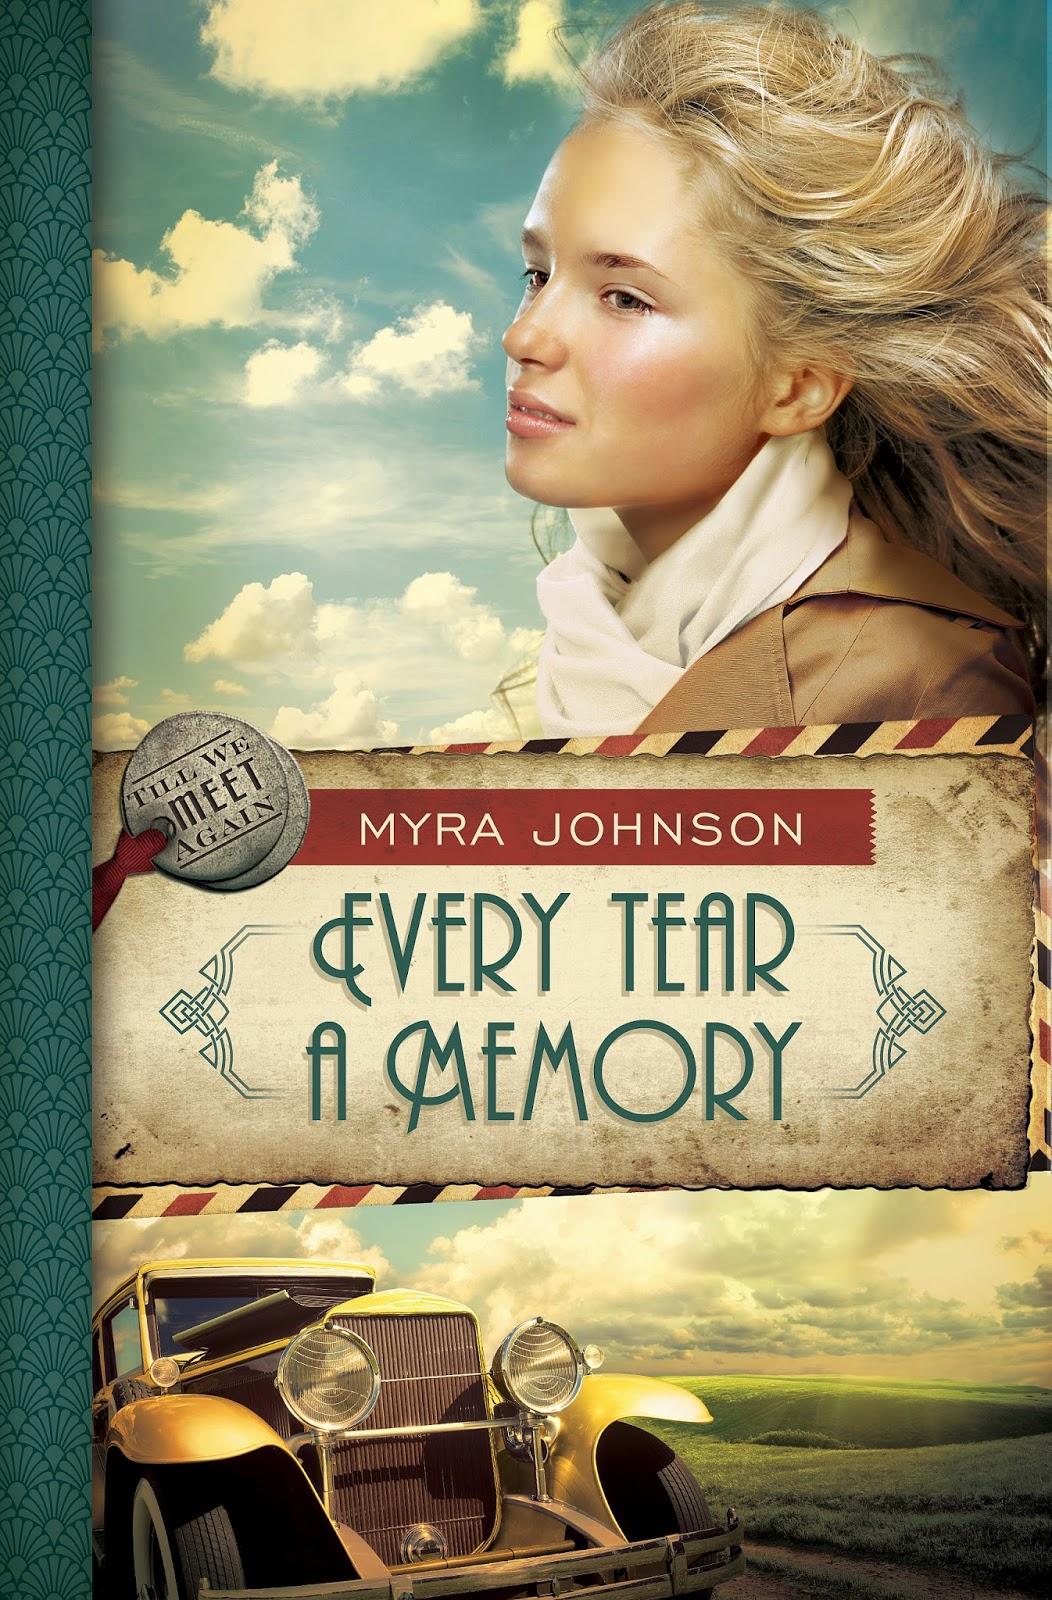 http://www.amazon.com/Every-Tear-Memory-Till-Again/dp/1426753721/ref=sr_1_1_title_1_pap?s=books&ie=UTF8&qid=1410464971&sr=1-1&keywords=every+tear+a+memory